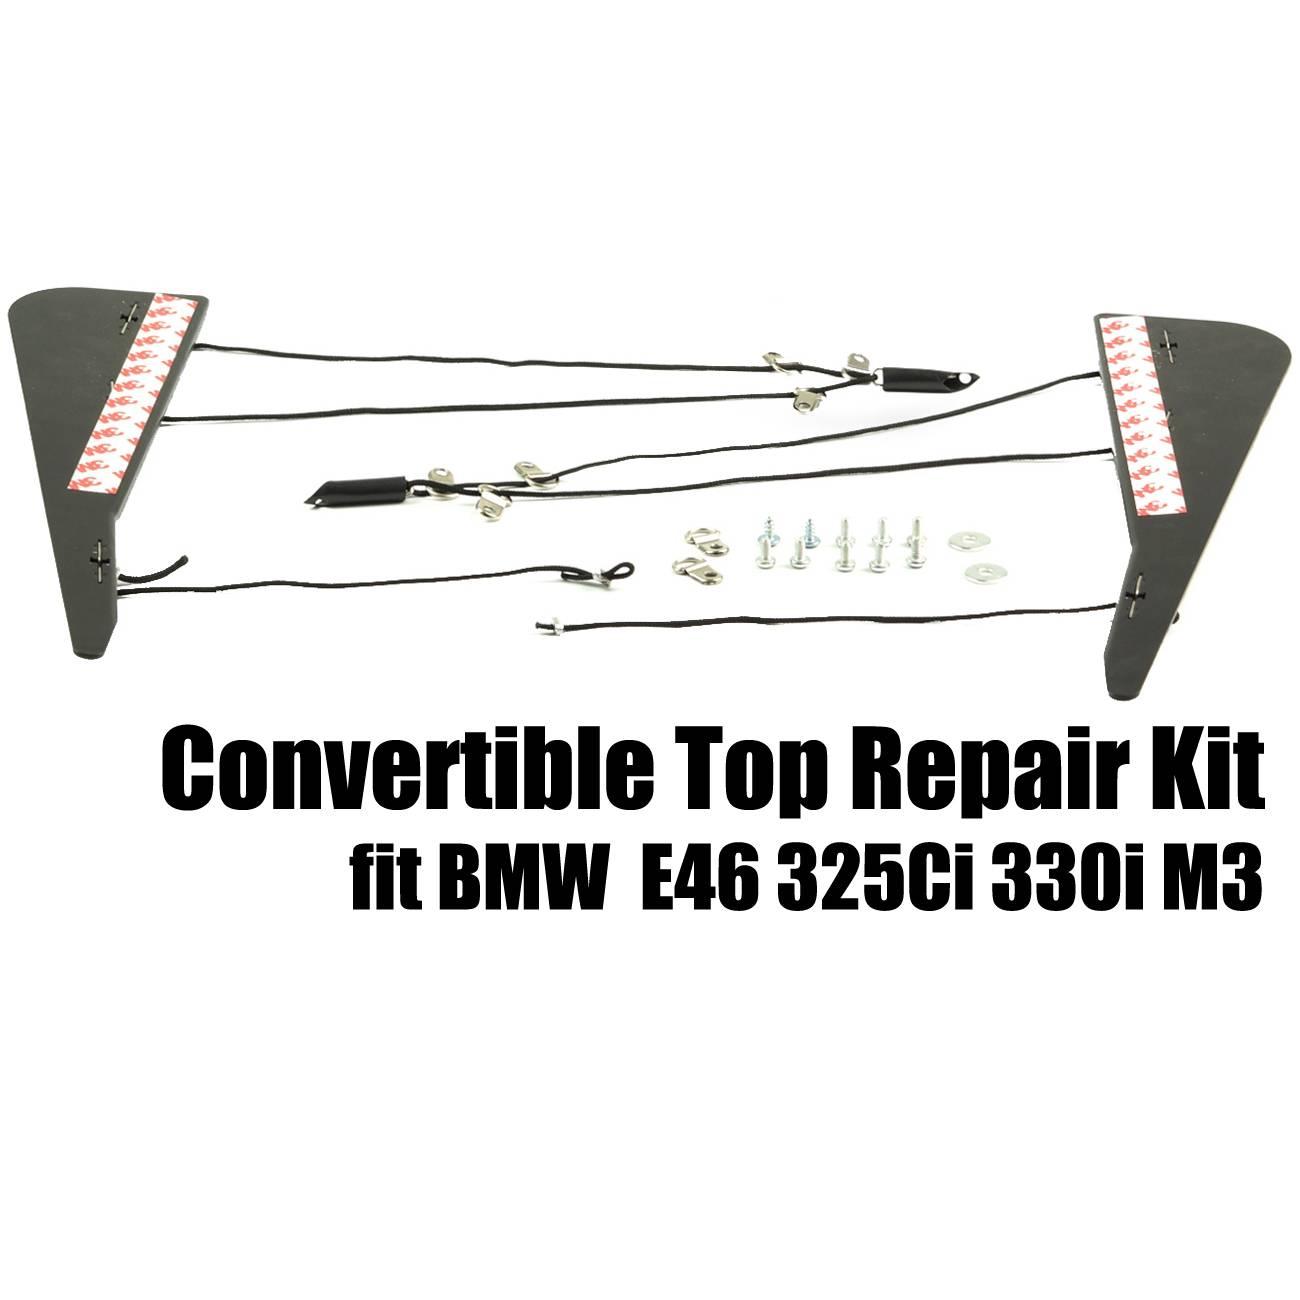 Top Repair Kit Convertible Top C Column For Bmw E46 323ci 330ci M3 54317135351 6971003560614 Ebay